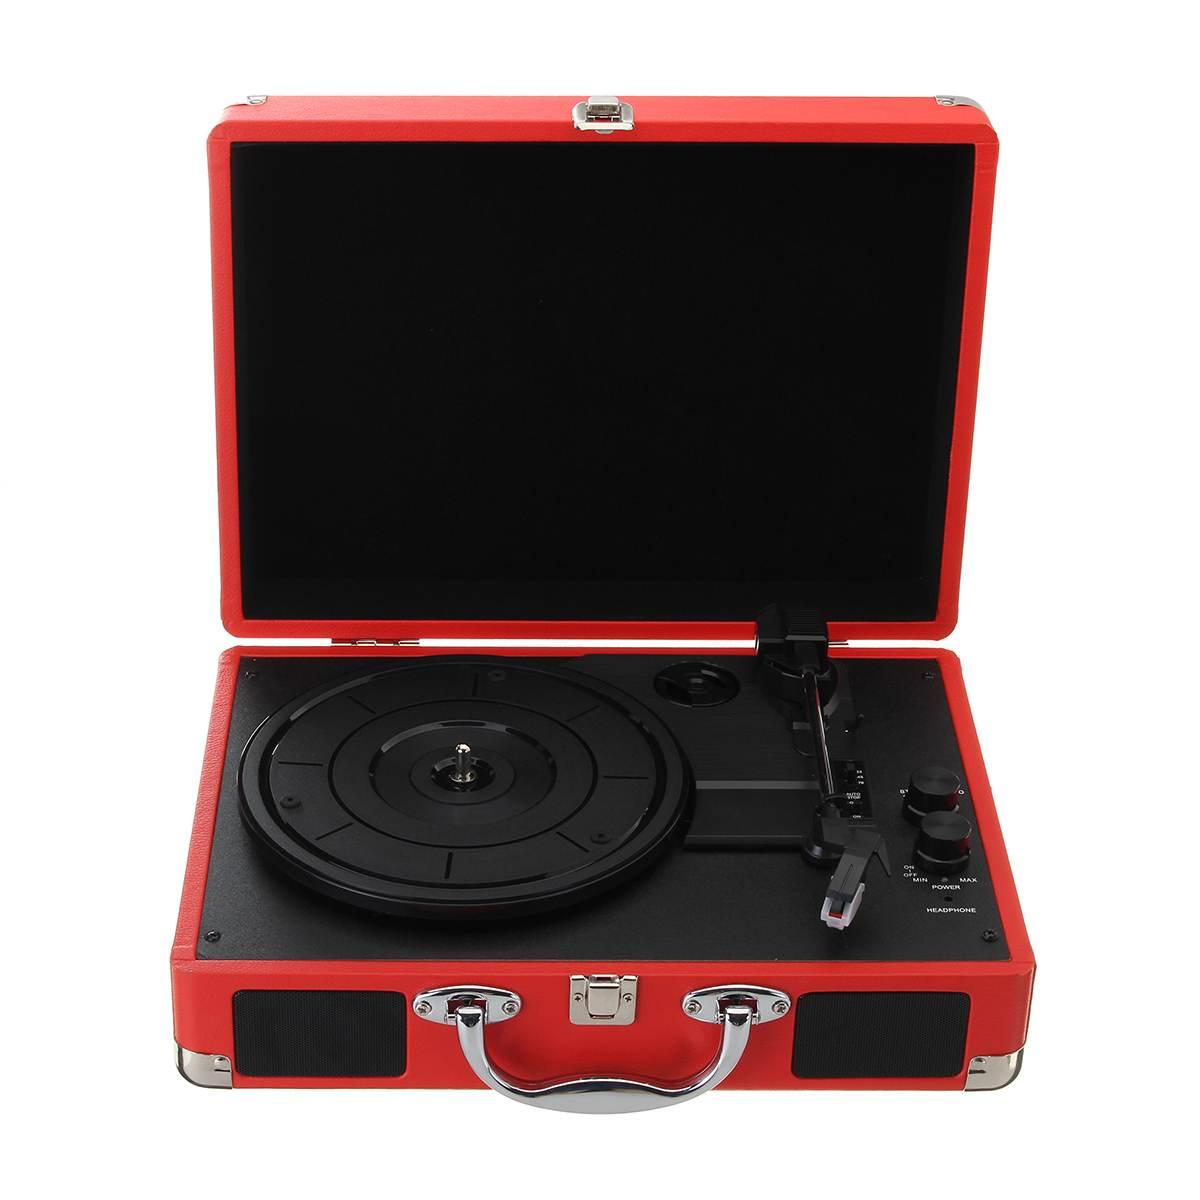 Plastic Wood Retro 33/45/78 RPM bluetooth PH/ INT/ BT 2.0 Suitcase Turntable Vinyl LP Record Phone Player 3-Speed 3.5mm AUX IN